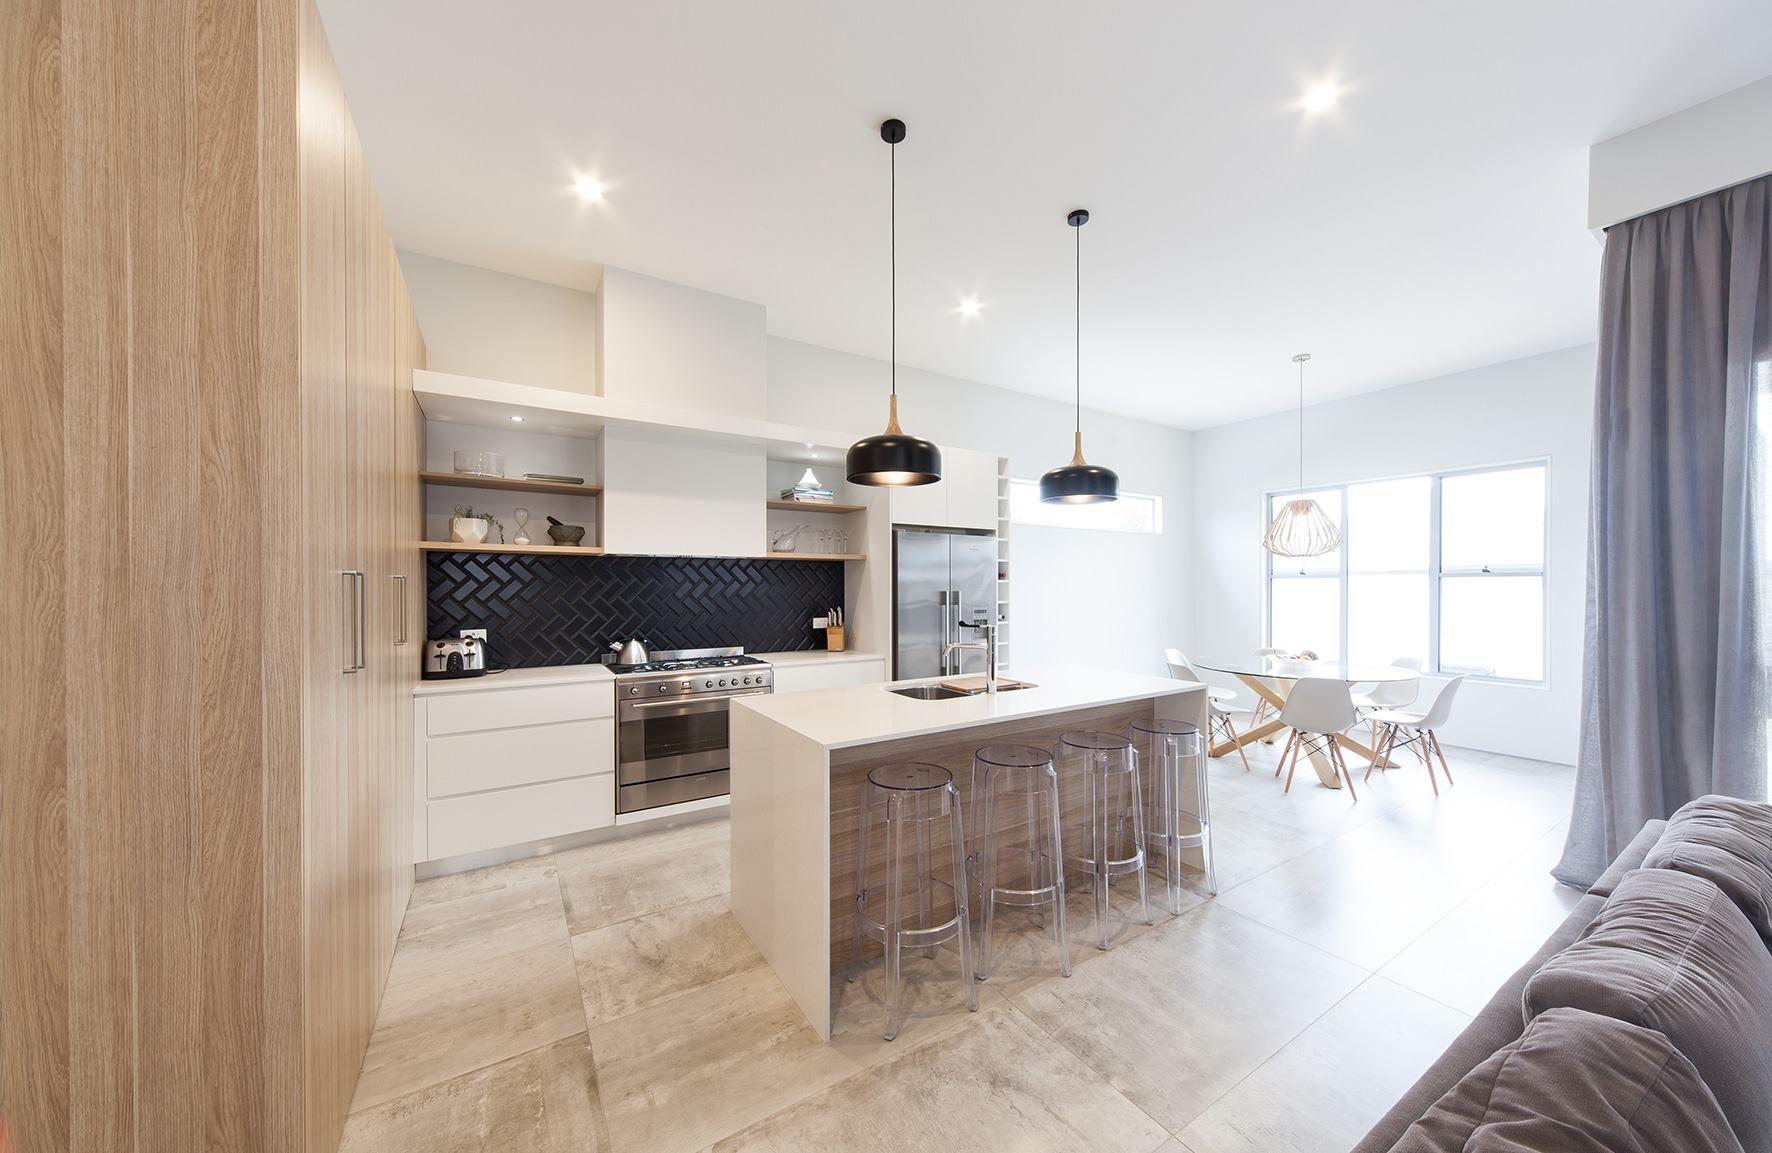 4600 Caesarstone Organic White Active Kitchens Joinery The